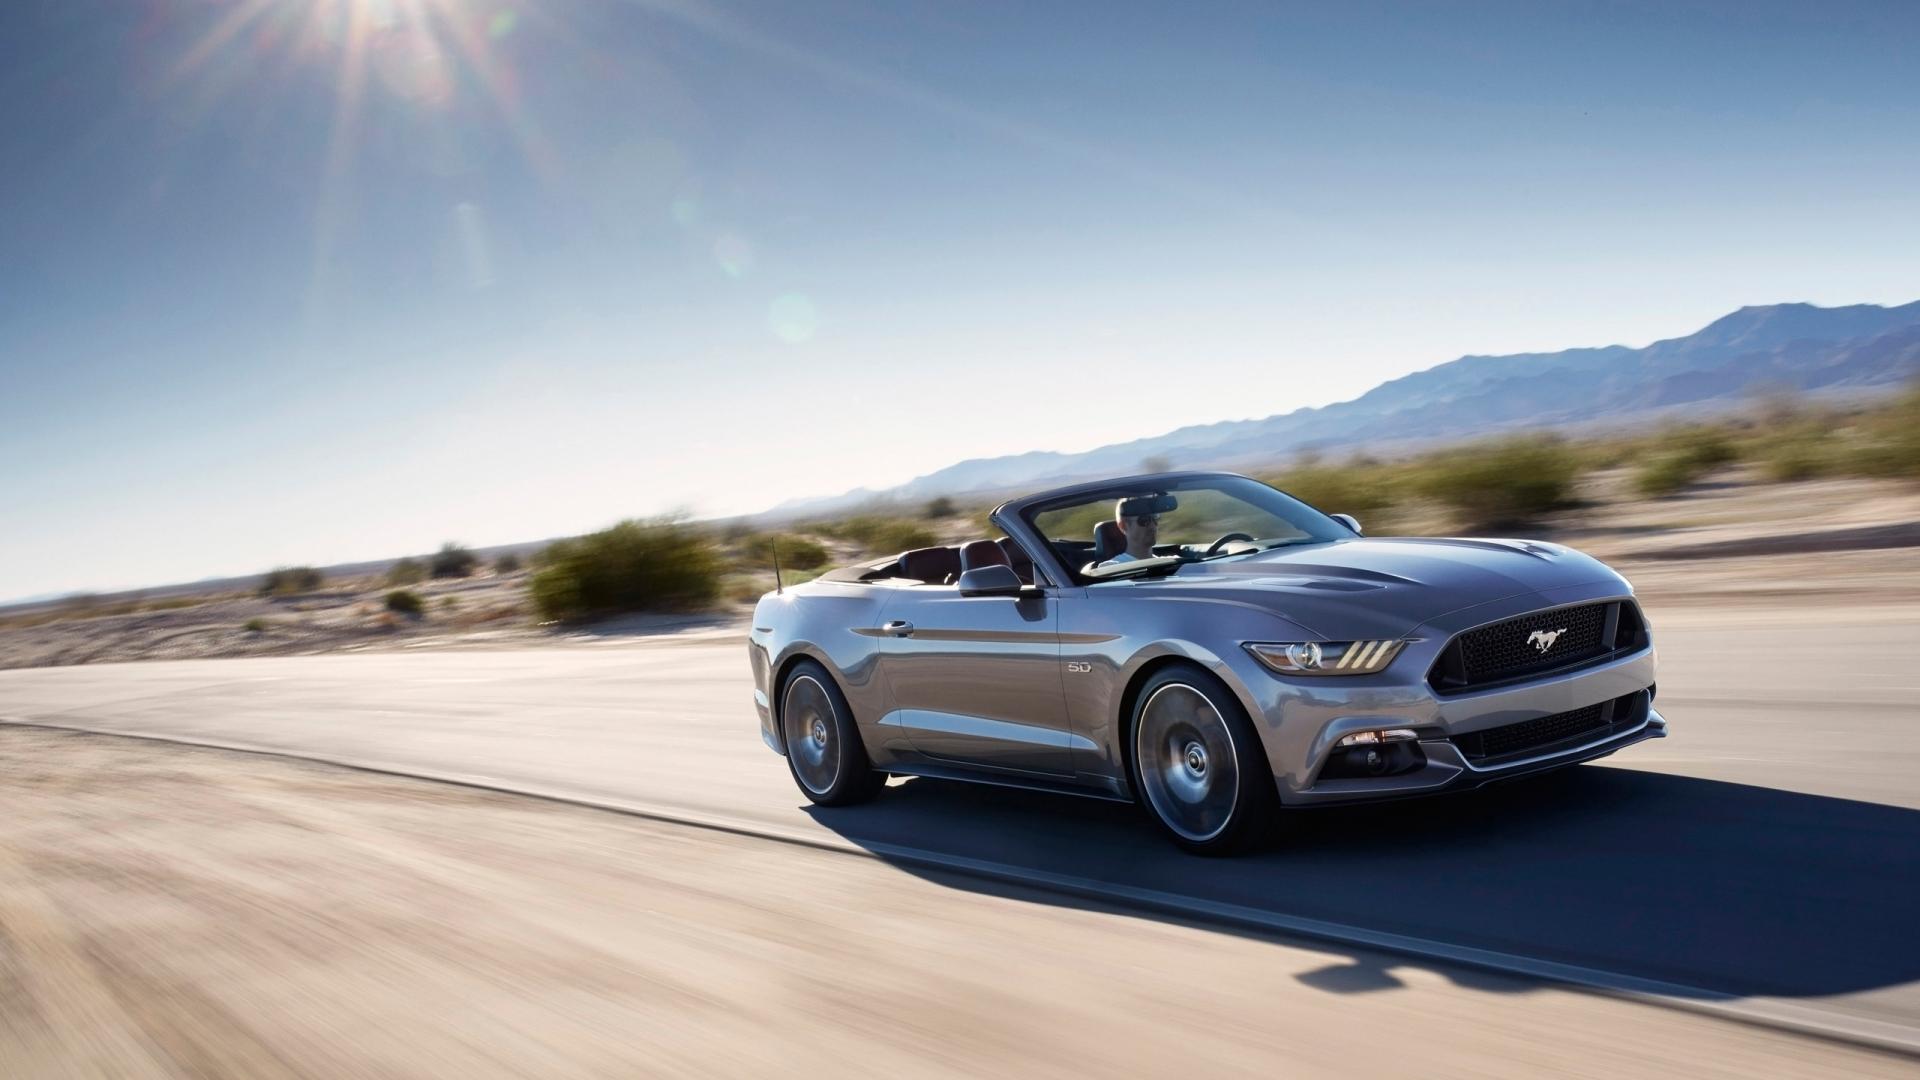 HD Car Desktop Wallpapers   2015 Ford Mustang Convertible 1920x1080